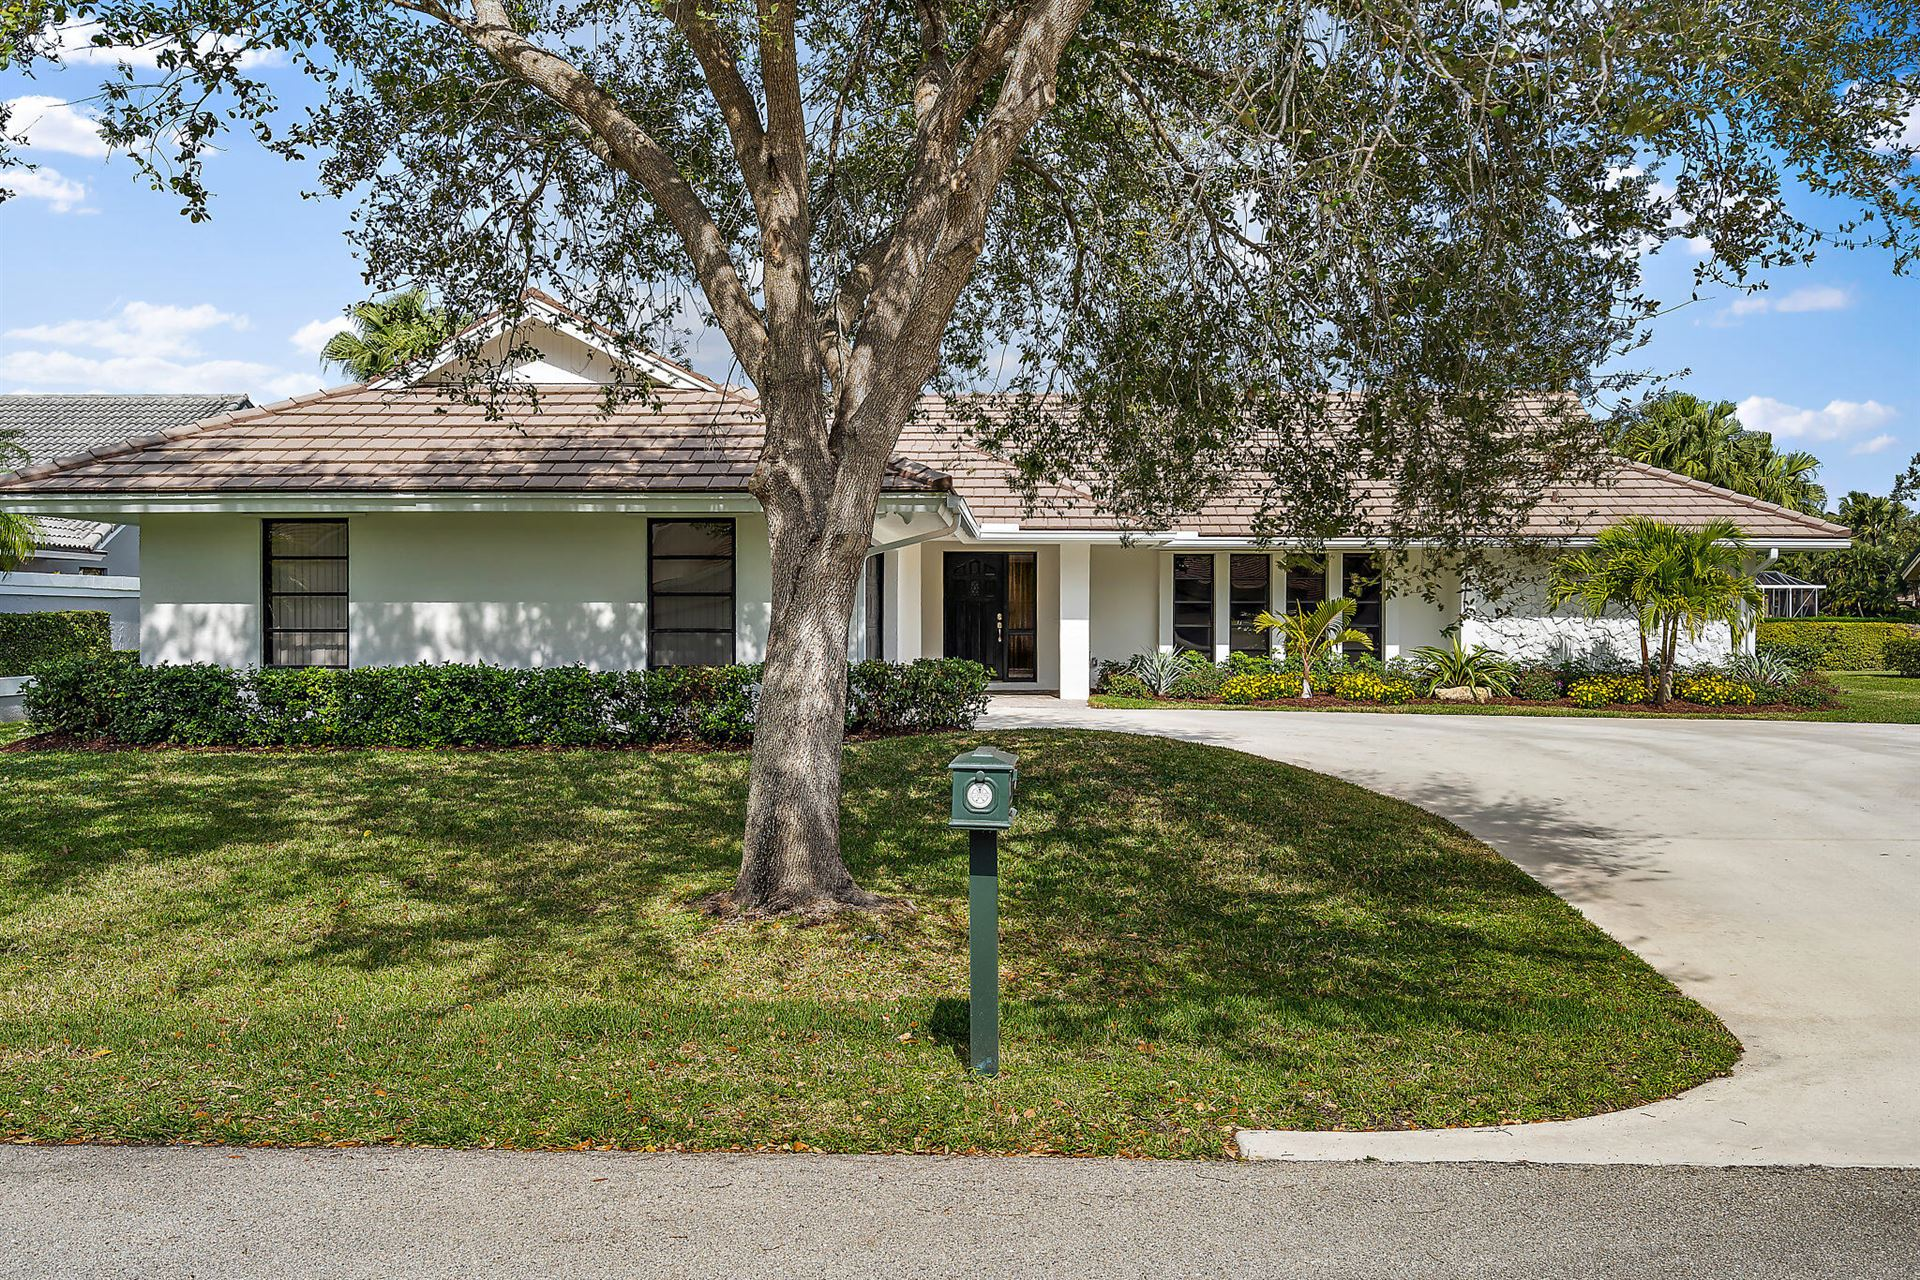 Photo of 10 Balfour Road E, Palm Beach Gardens, FL 33418 (MLS # RX-10740337)